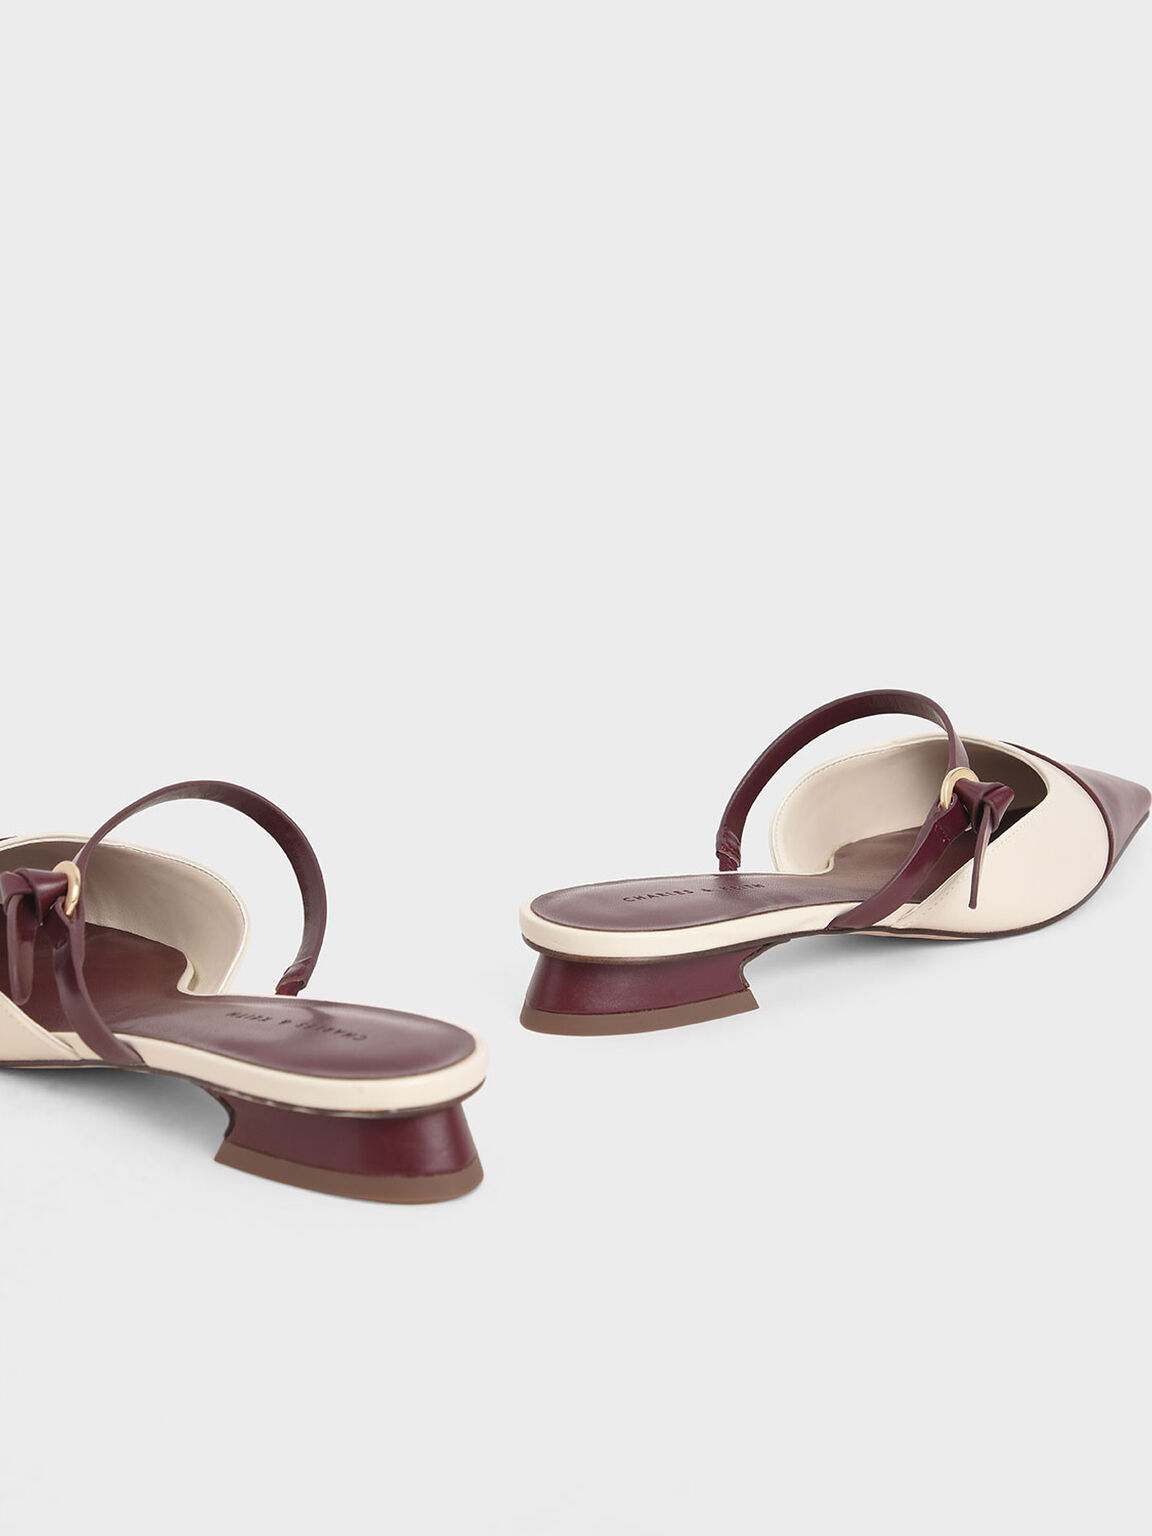 Mary Jane Strap Flat Mules, Maroon, hi-res